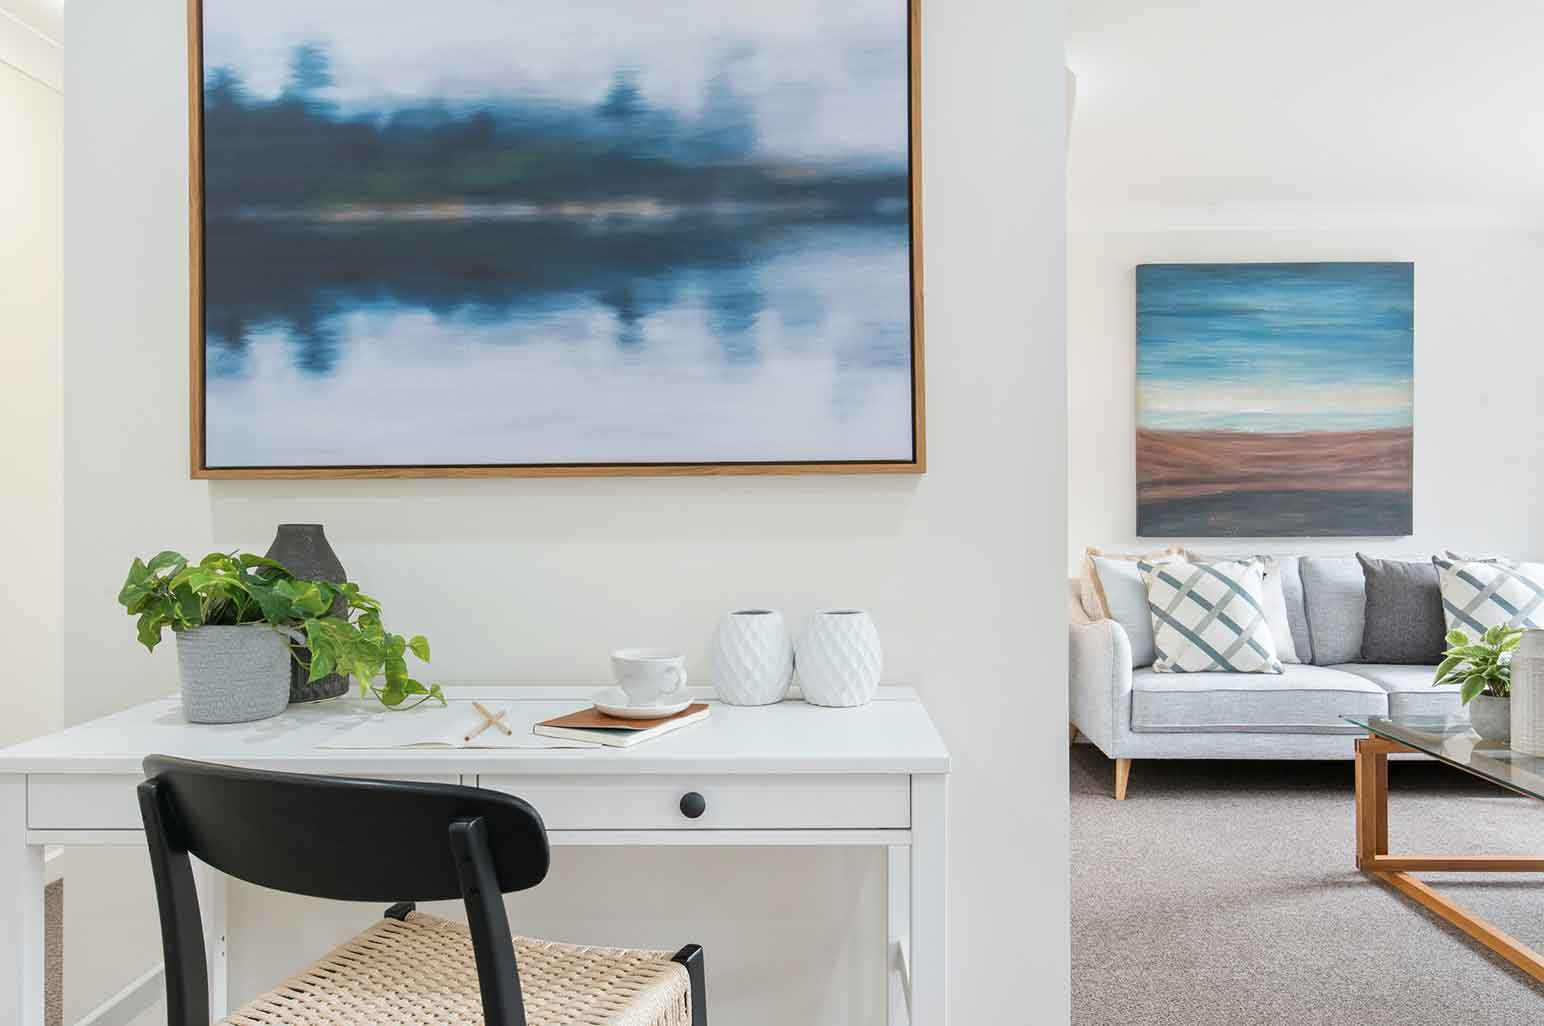 Décor Tips to Modernize Your Home